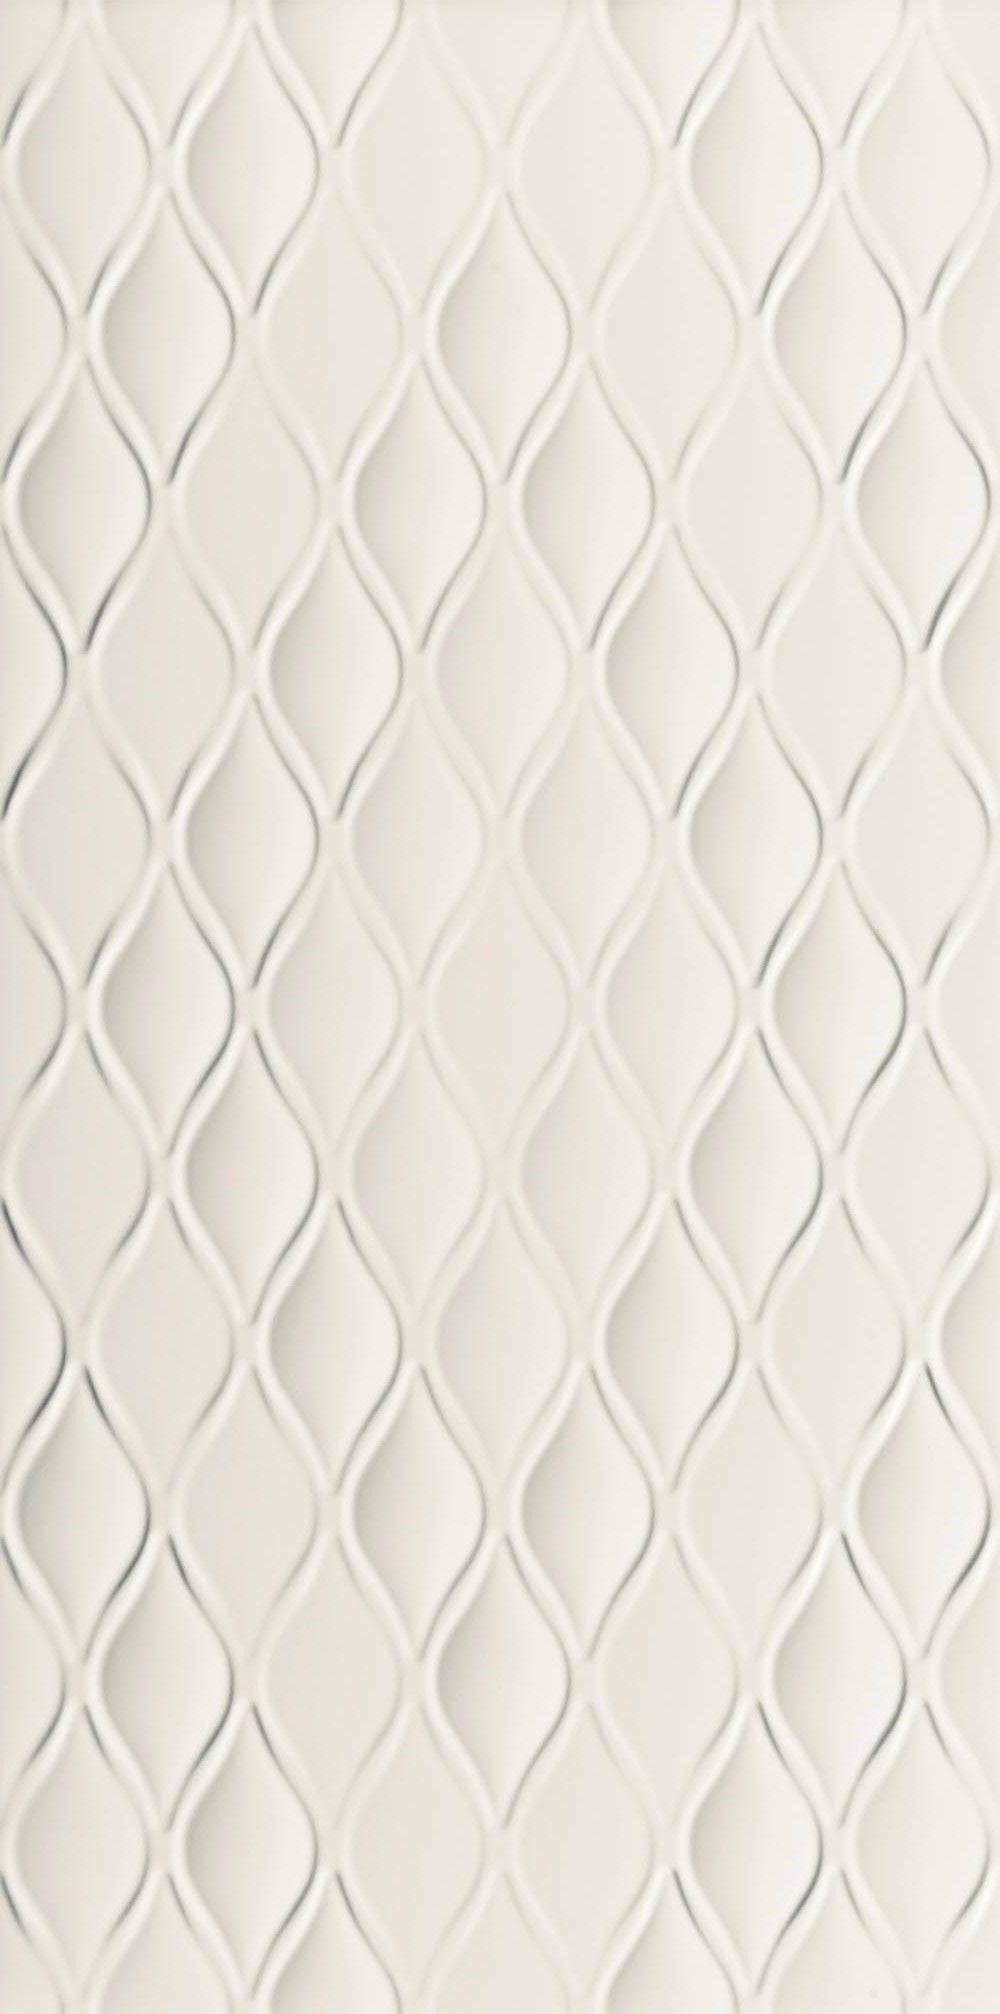 Multidimensional 3d Textured Ceramic Wall Tiles Ceramic Wall